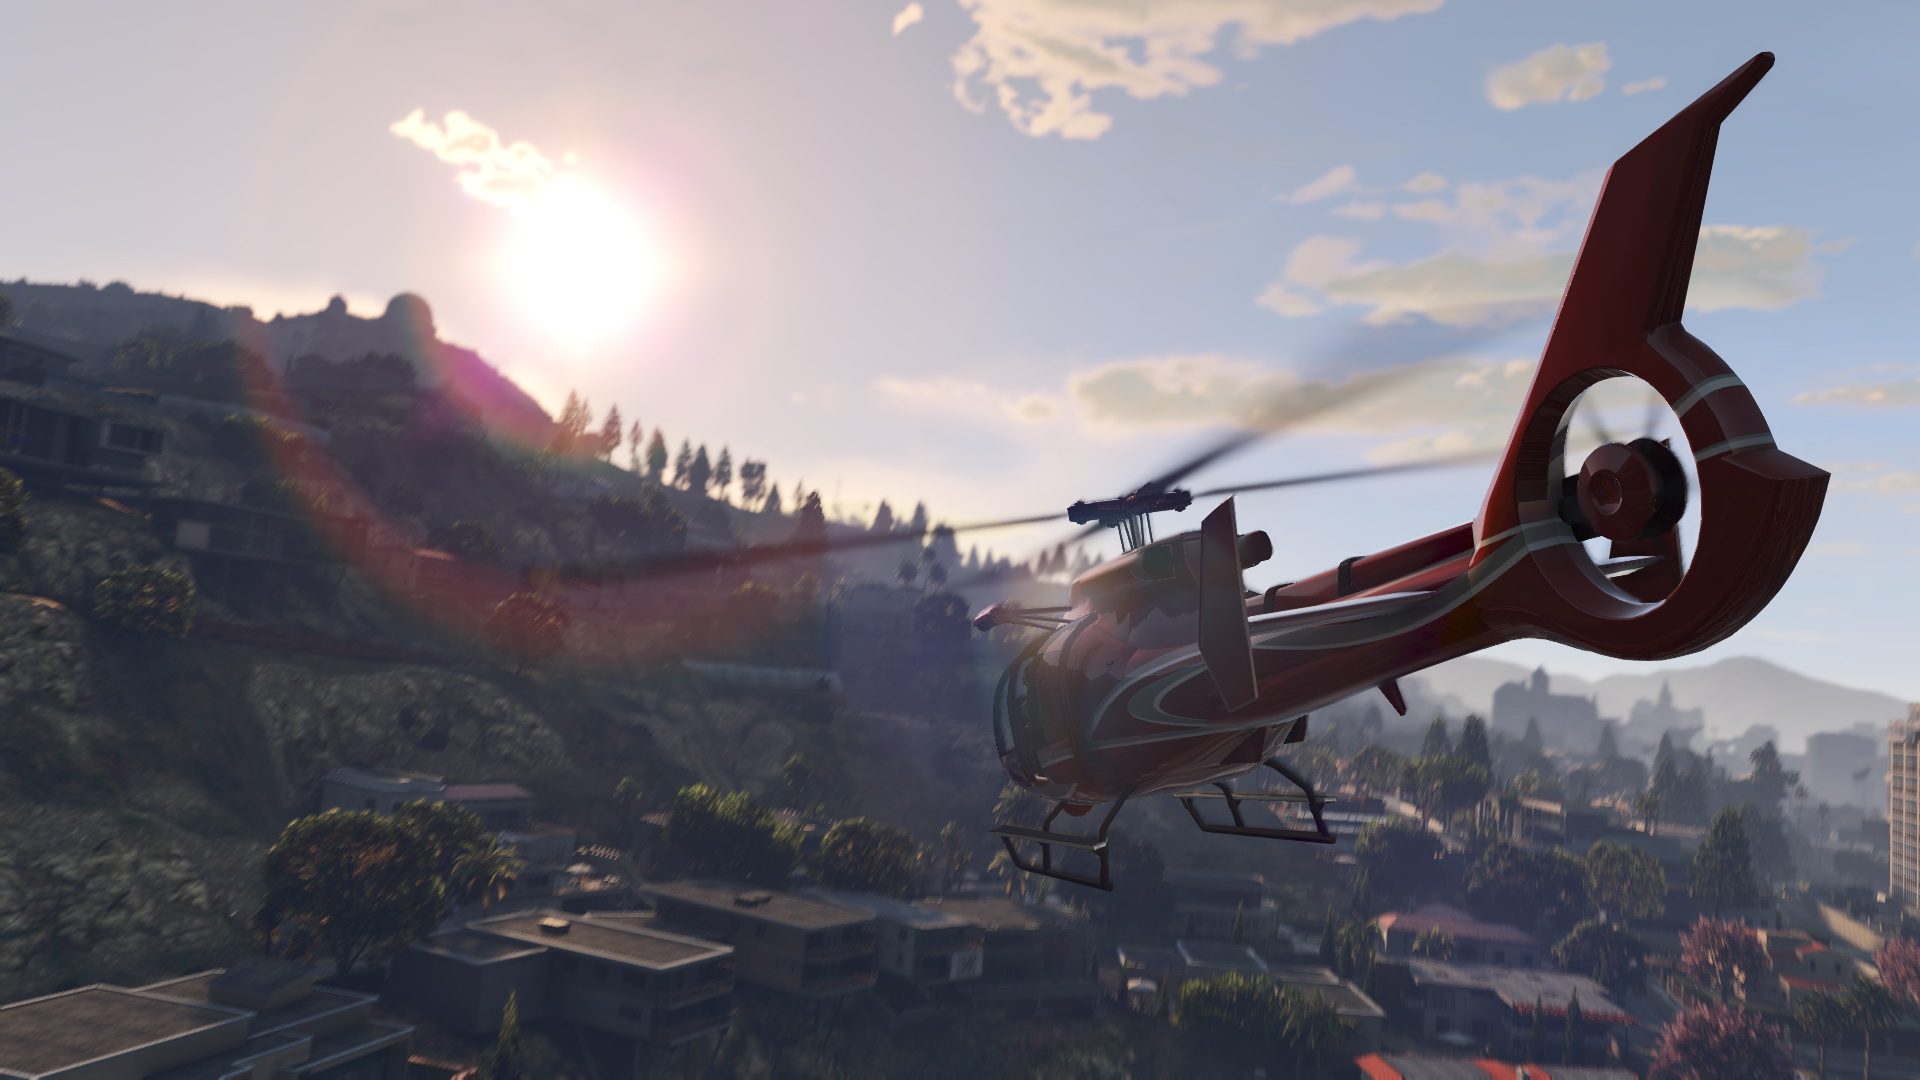 Imágenes De Grand Theft Auto V Meristation